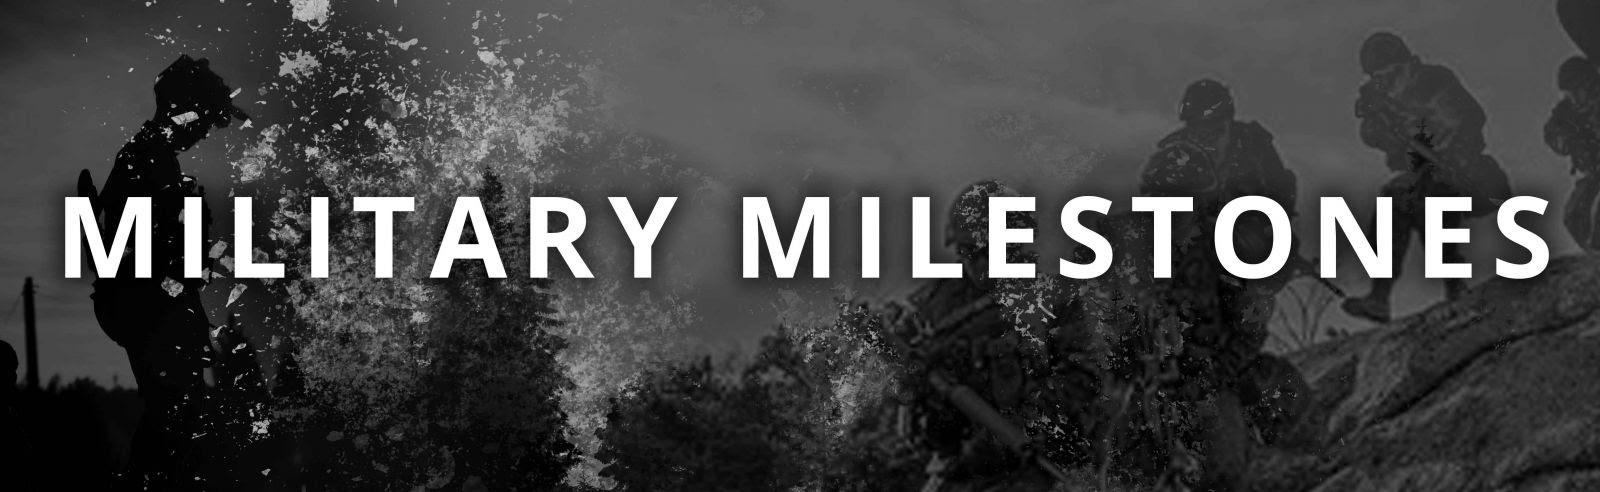 Military Milestones